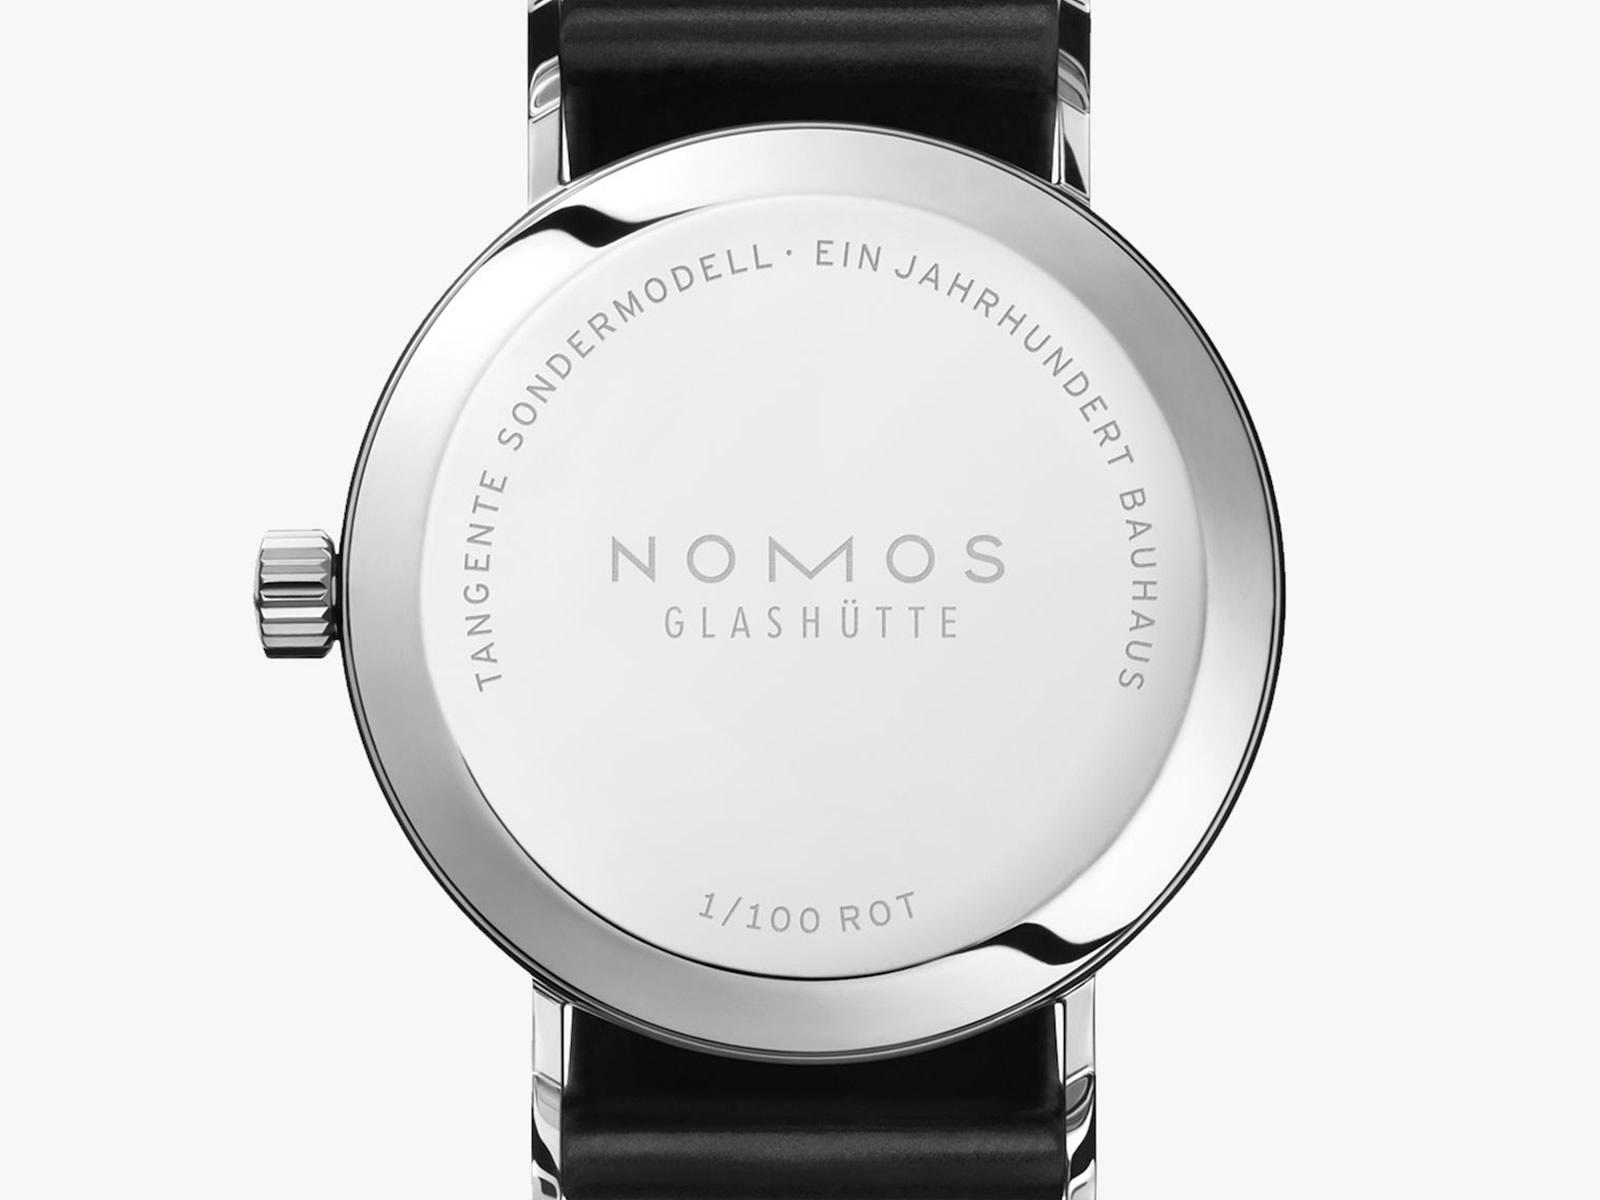 nomos-glashutte-tangente-bauhaus-case-.jpg